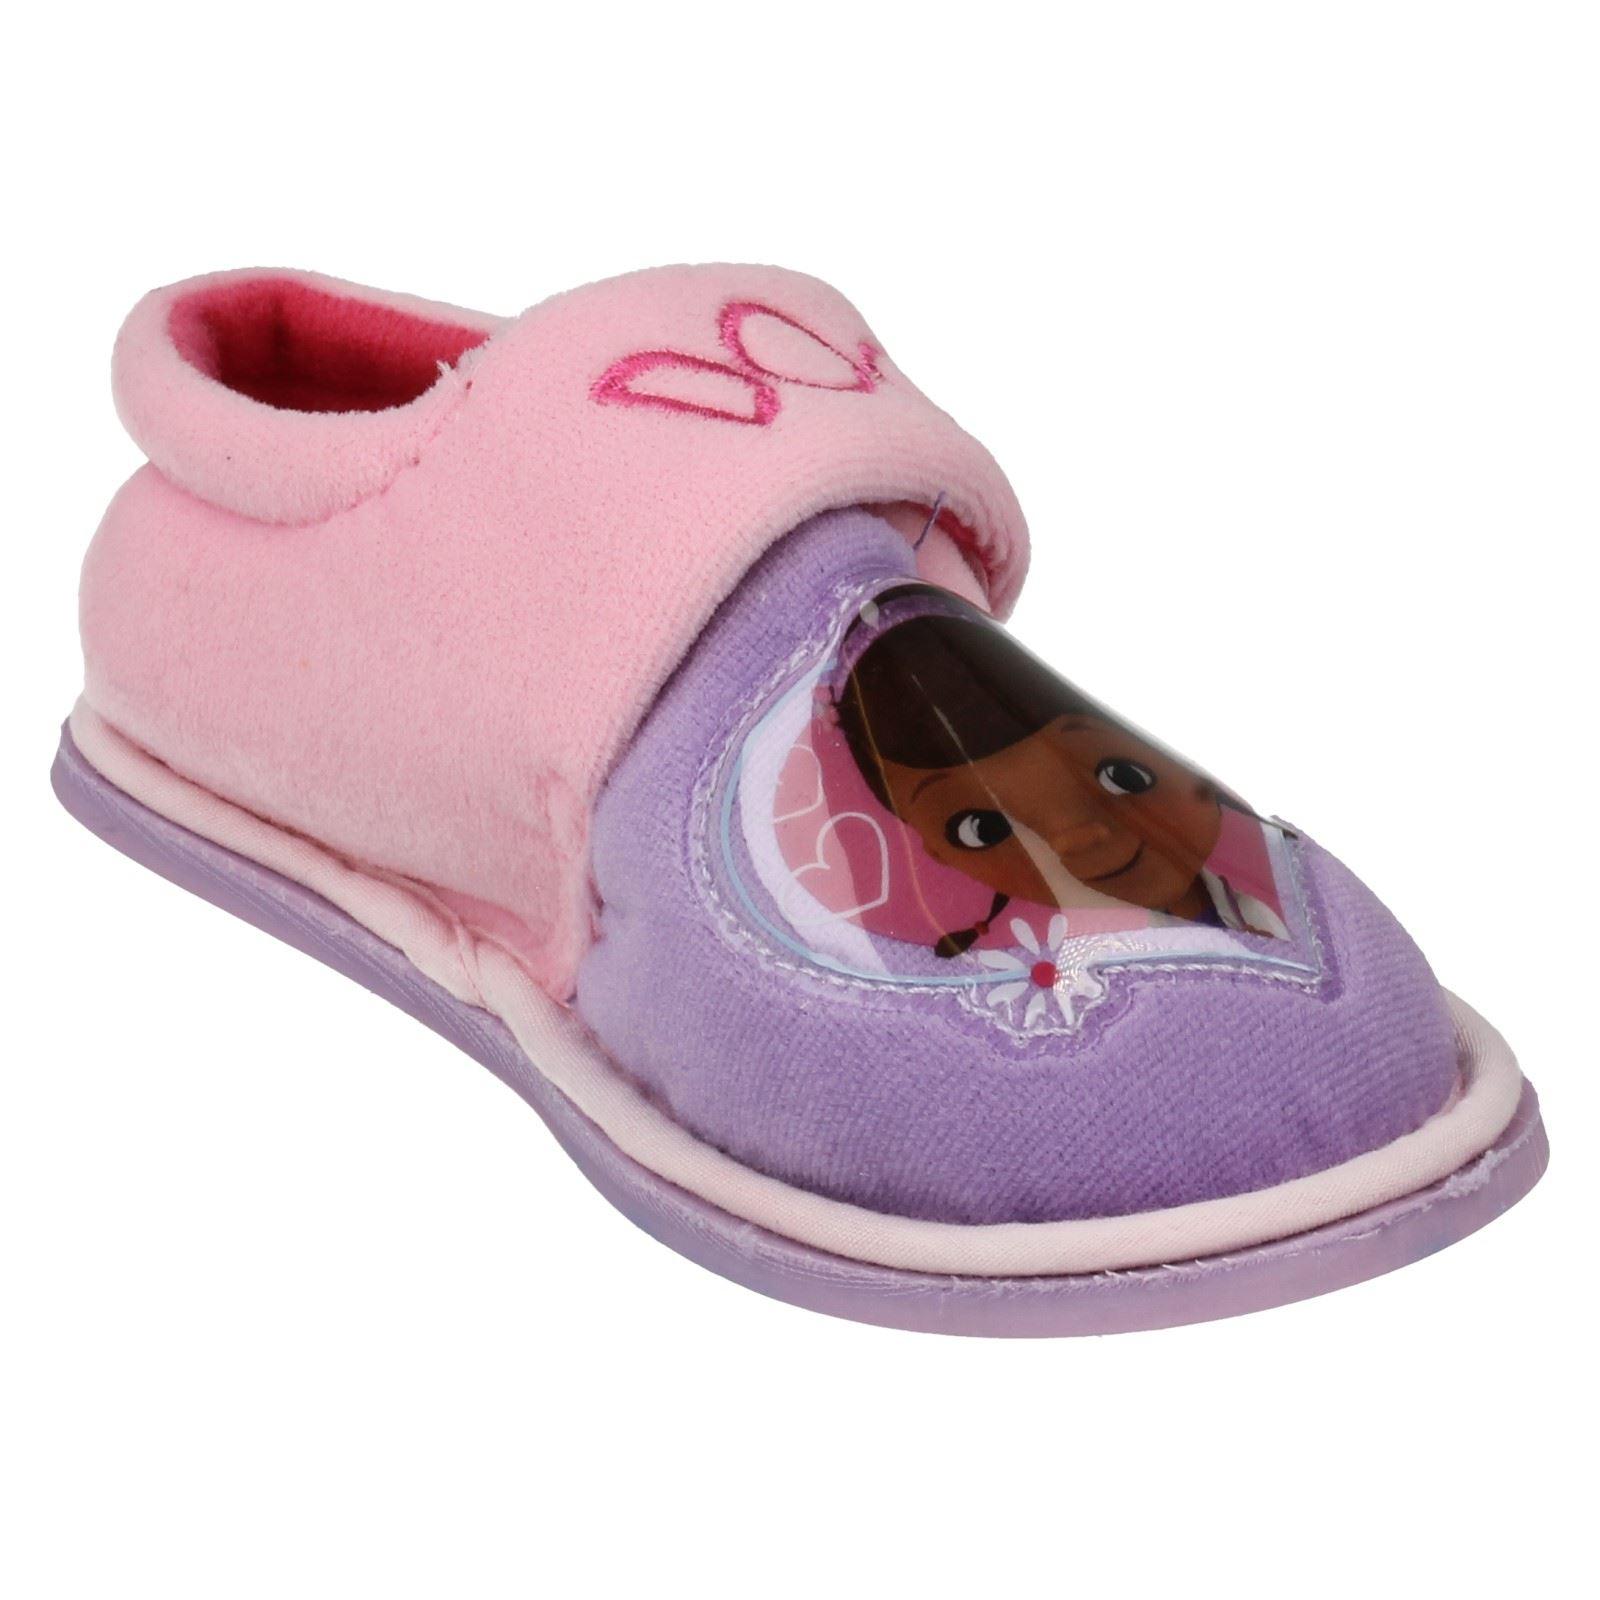 Girls Doc McStuffins Slippers Label - Doc Daisy